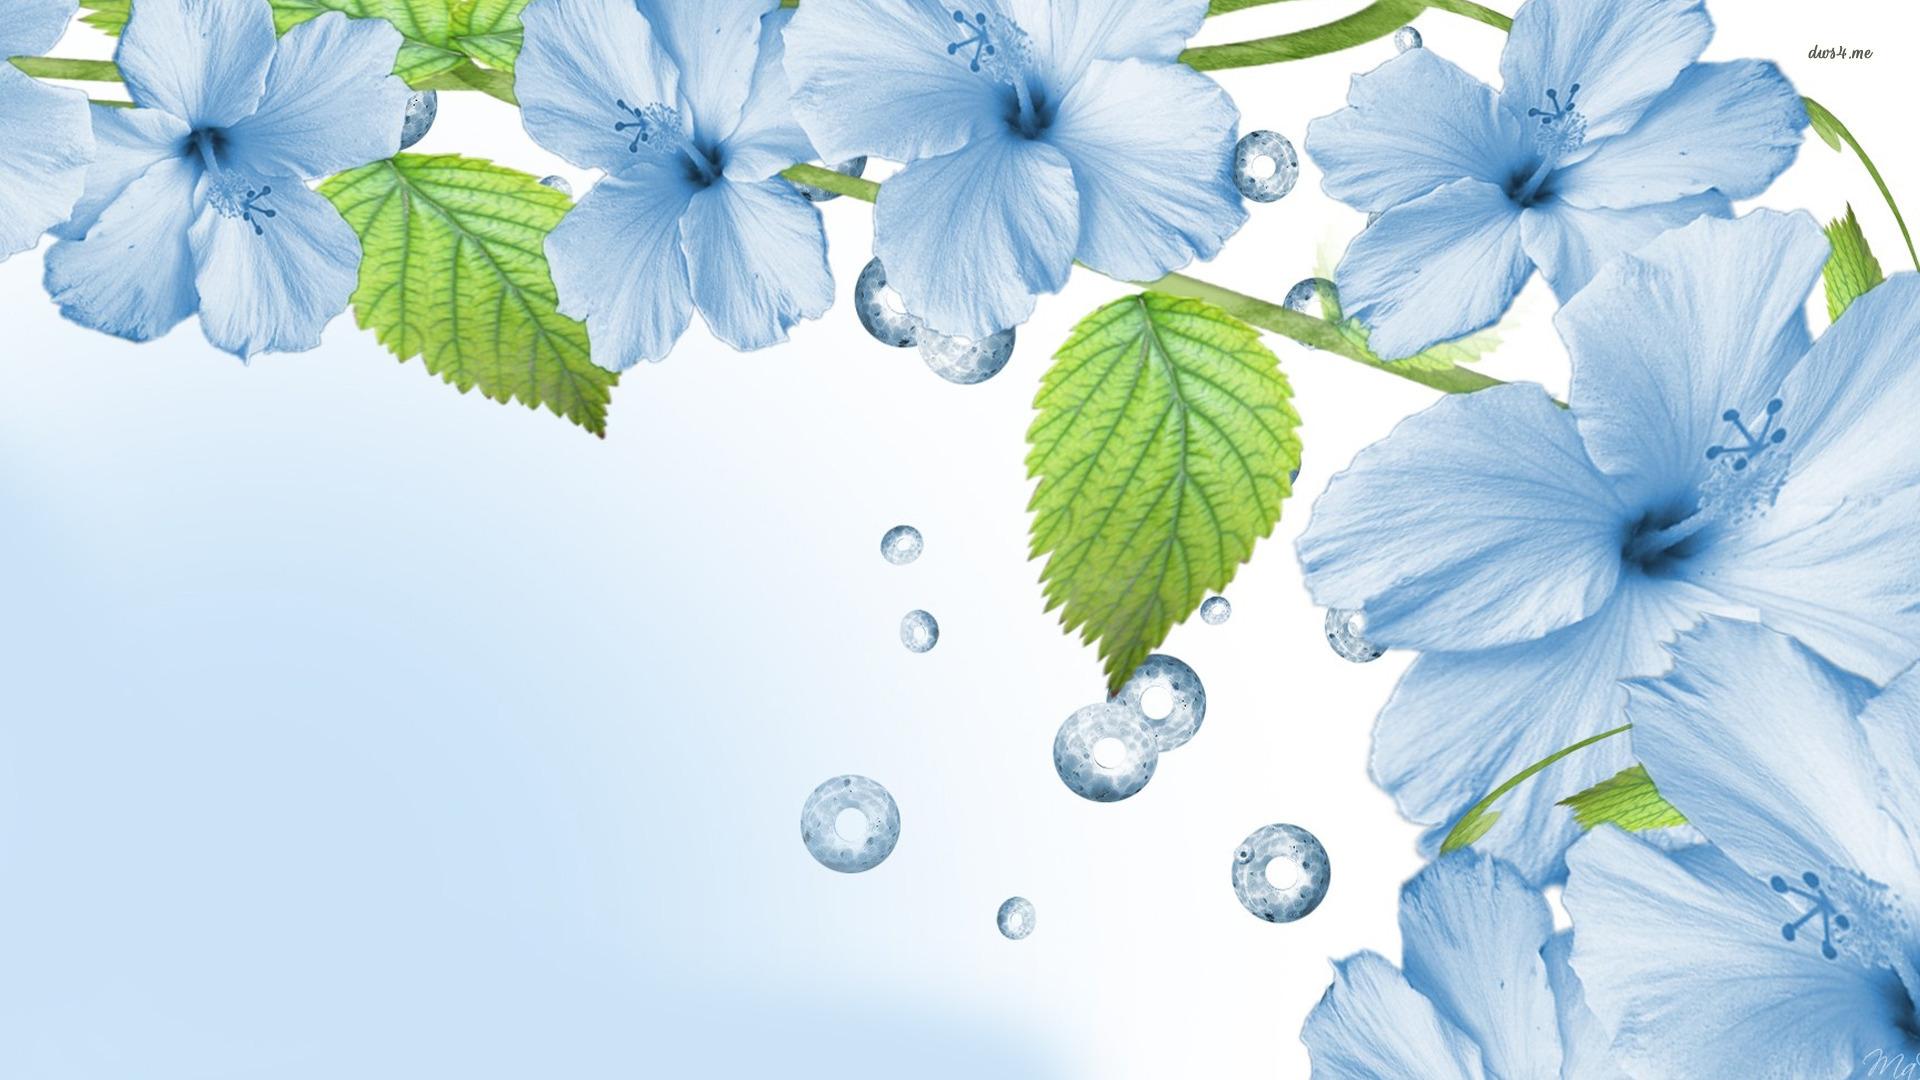 Blue Flowers wallpaper Blue Flowers wallpapers HD free - 263404